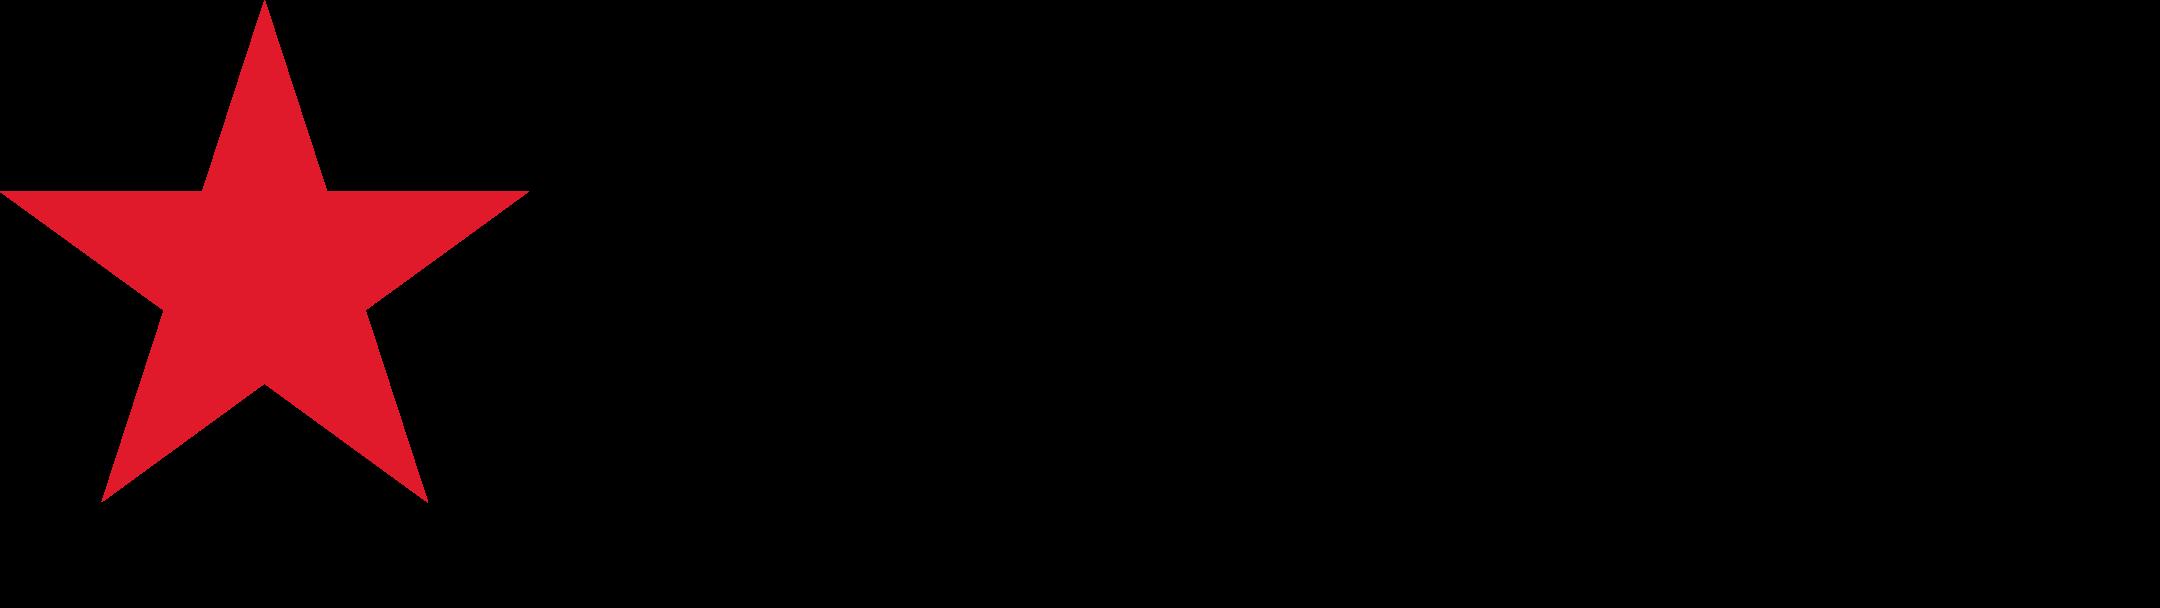 macys logo 1 - Macy's Logo